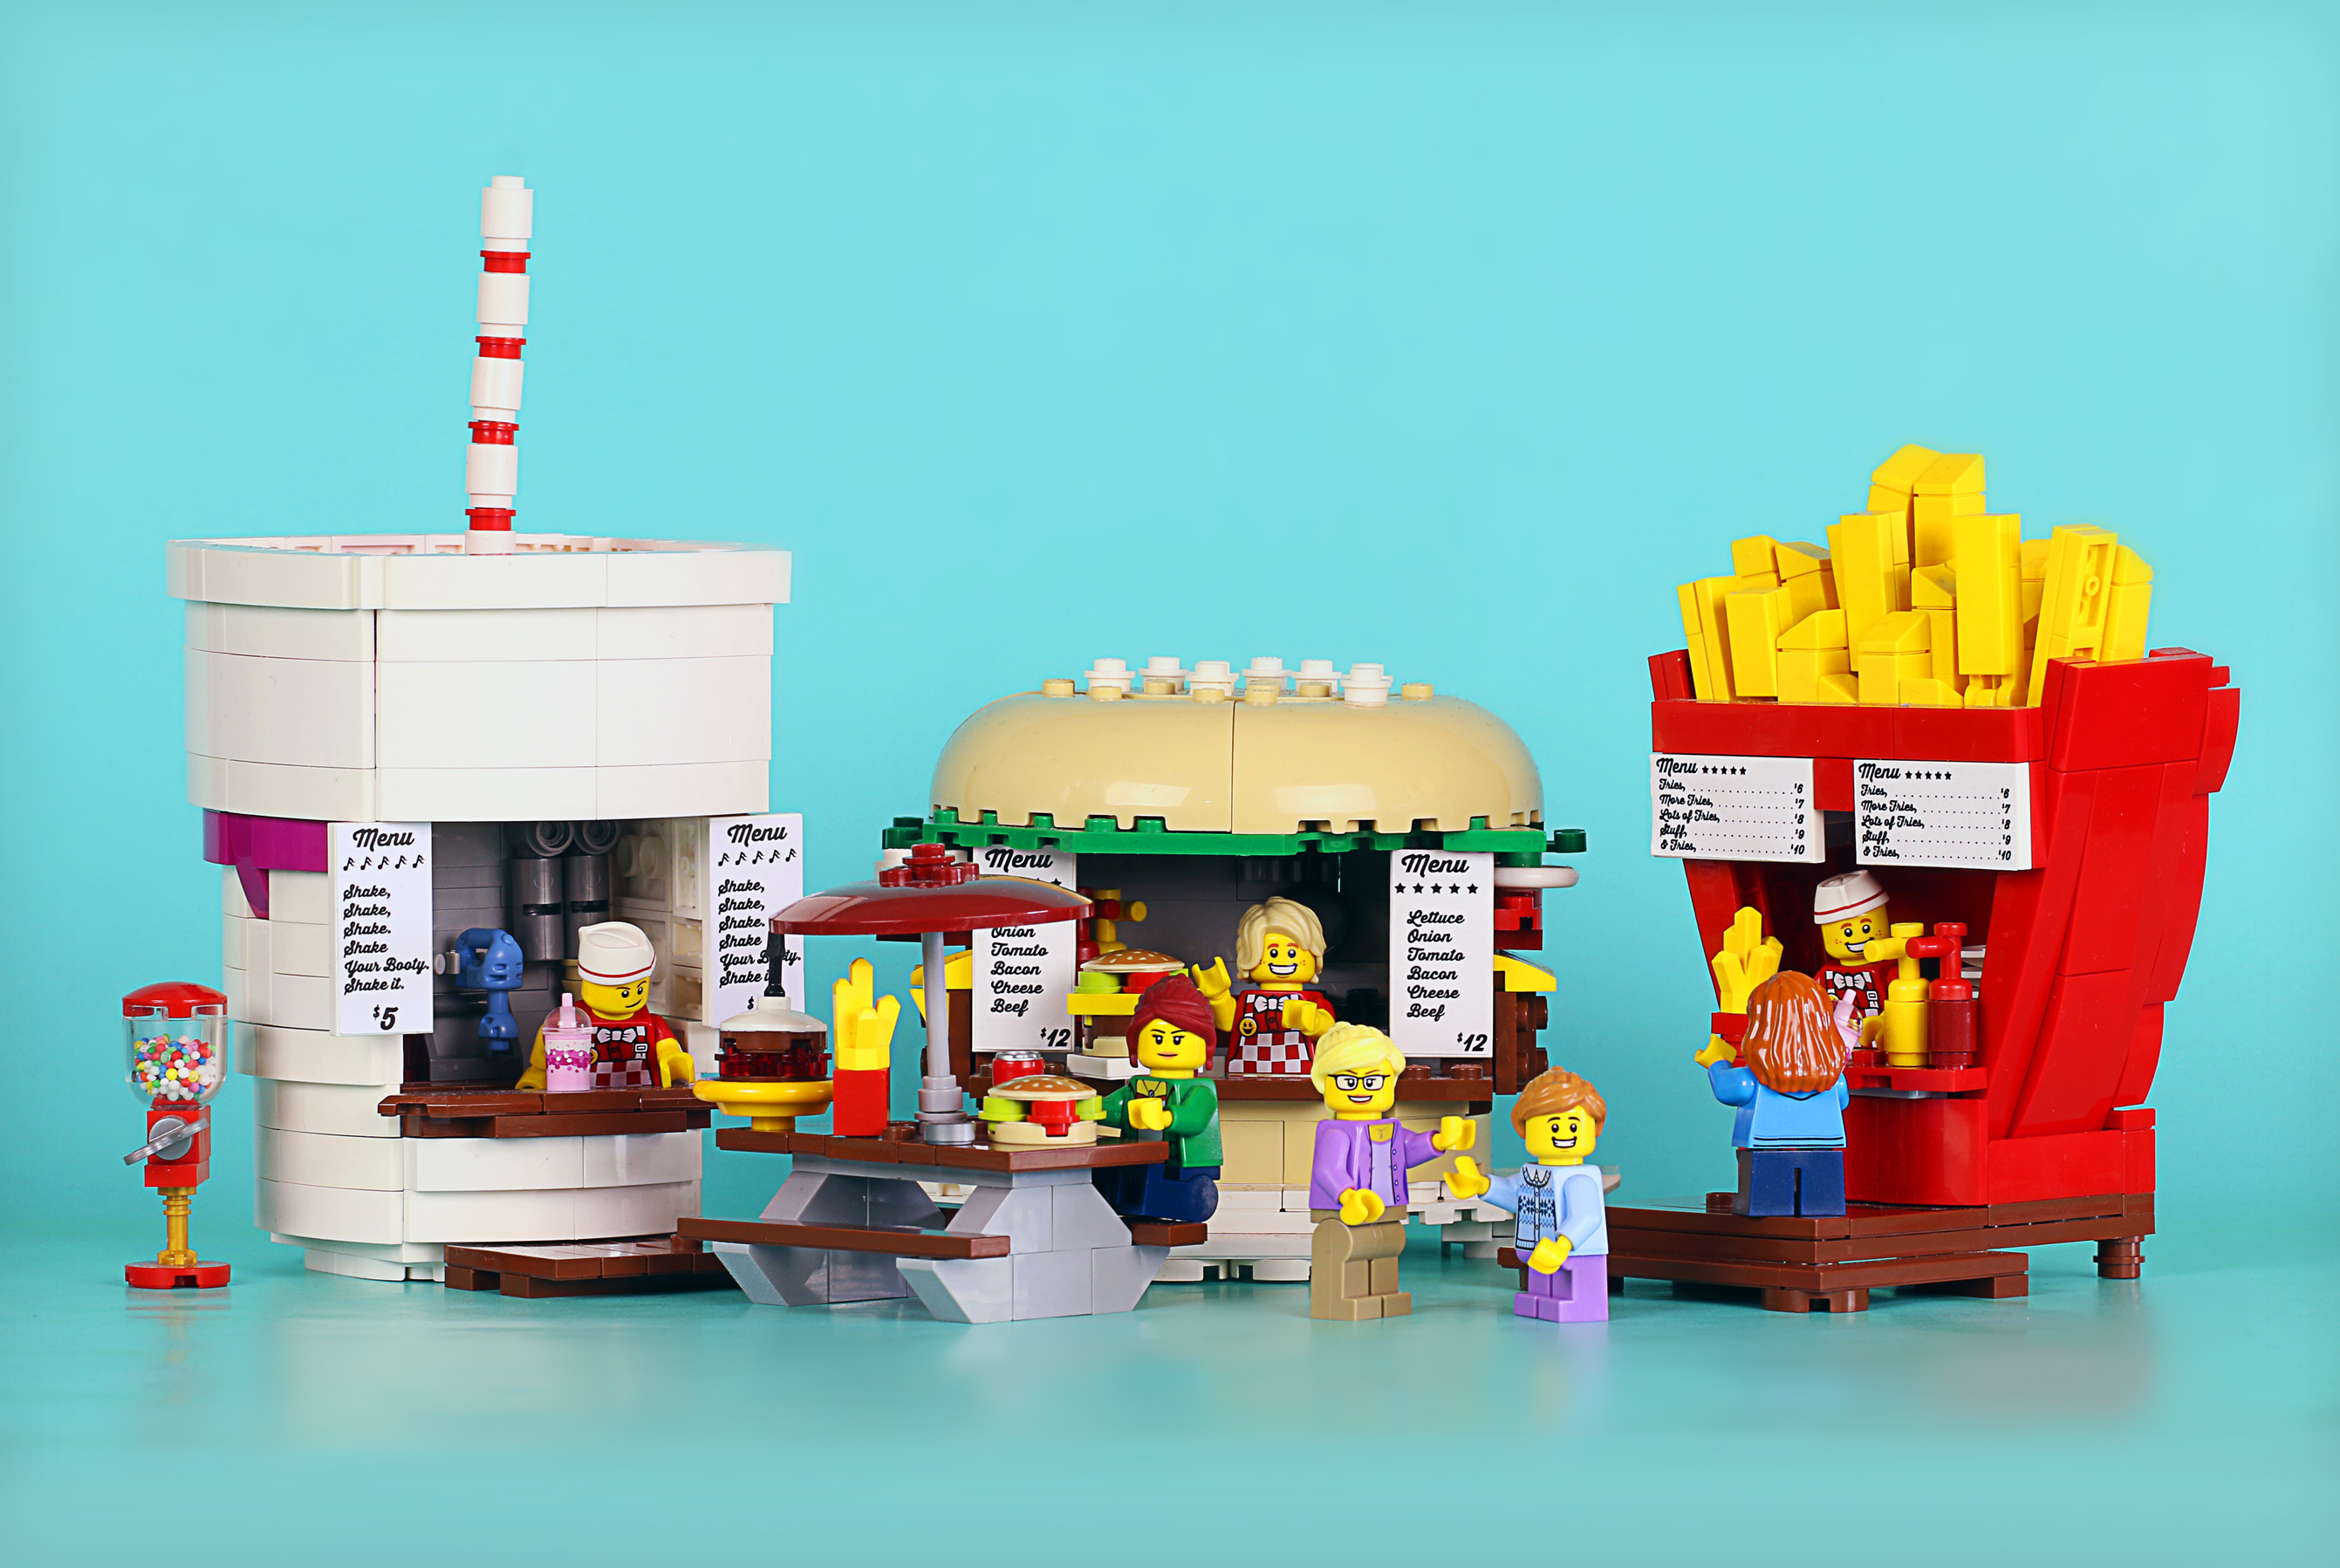 lego-ideas-food-stand-diners-frostbricks zusammengebaut.com